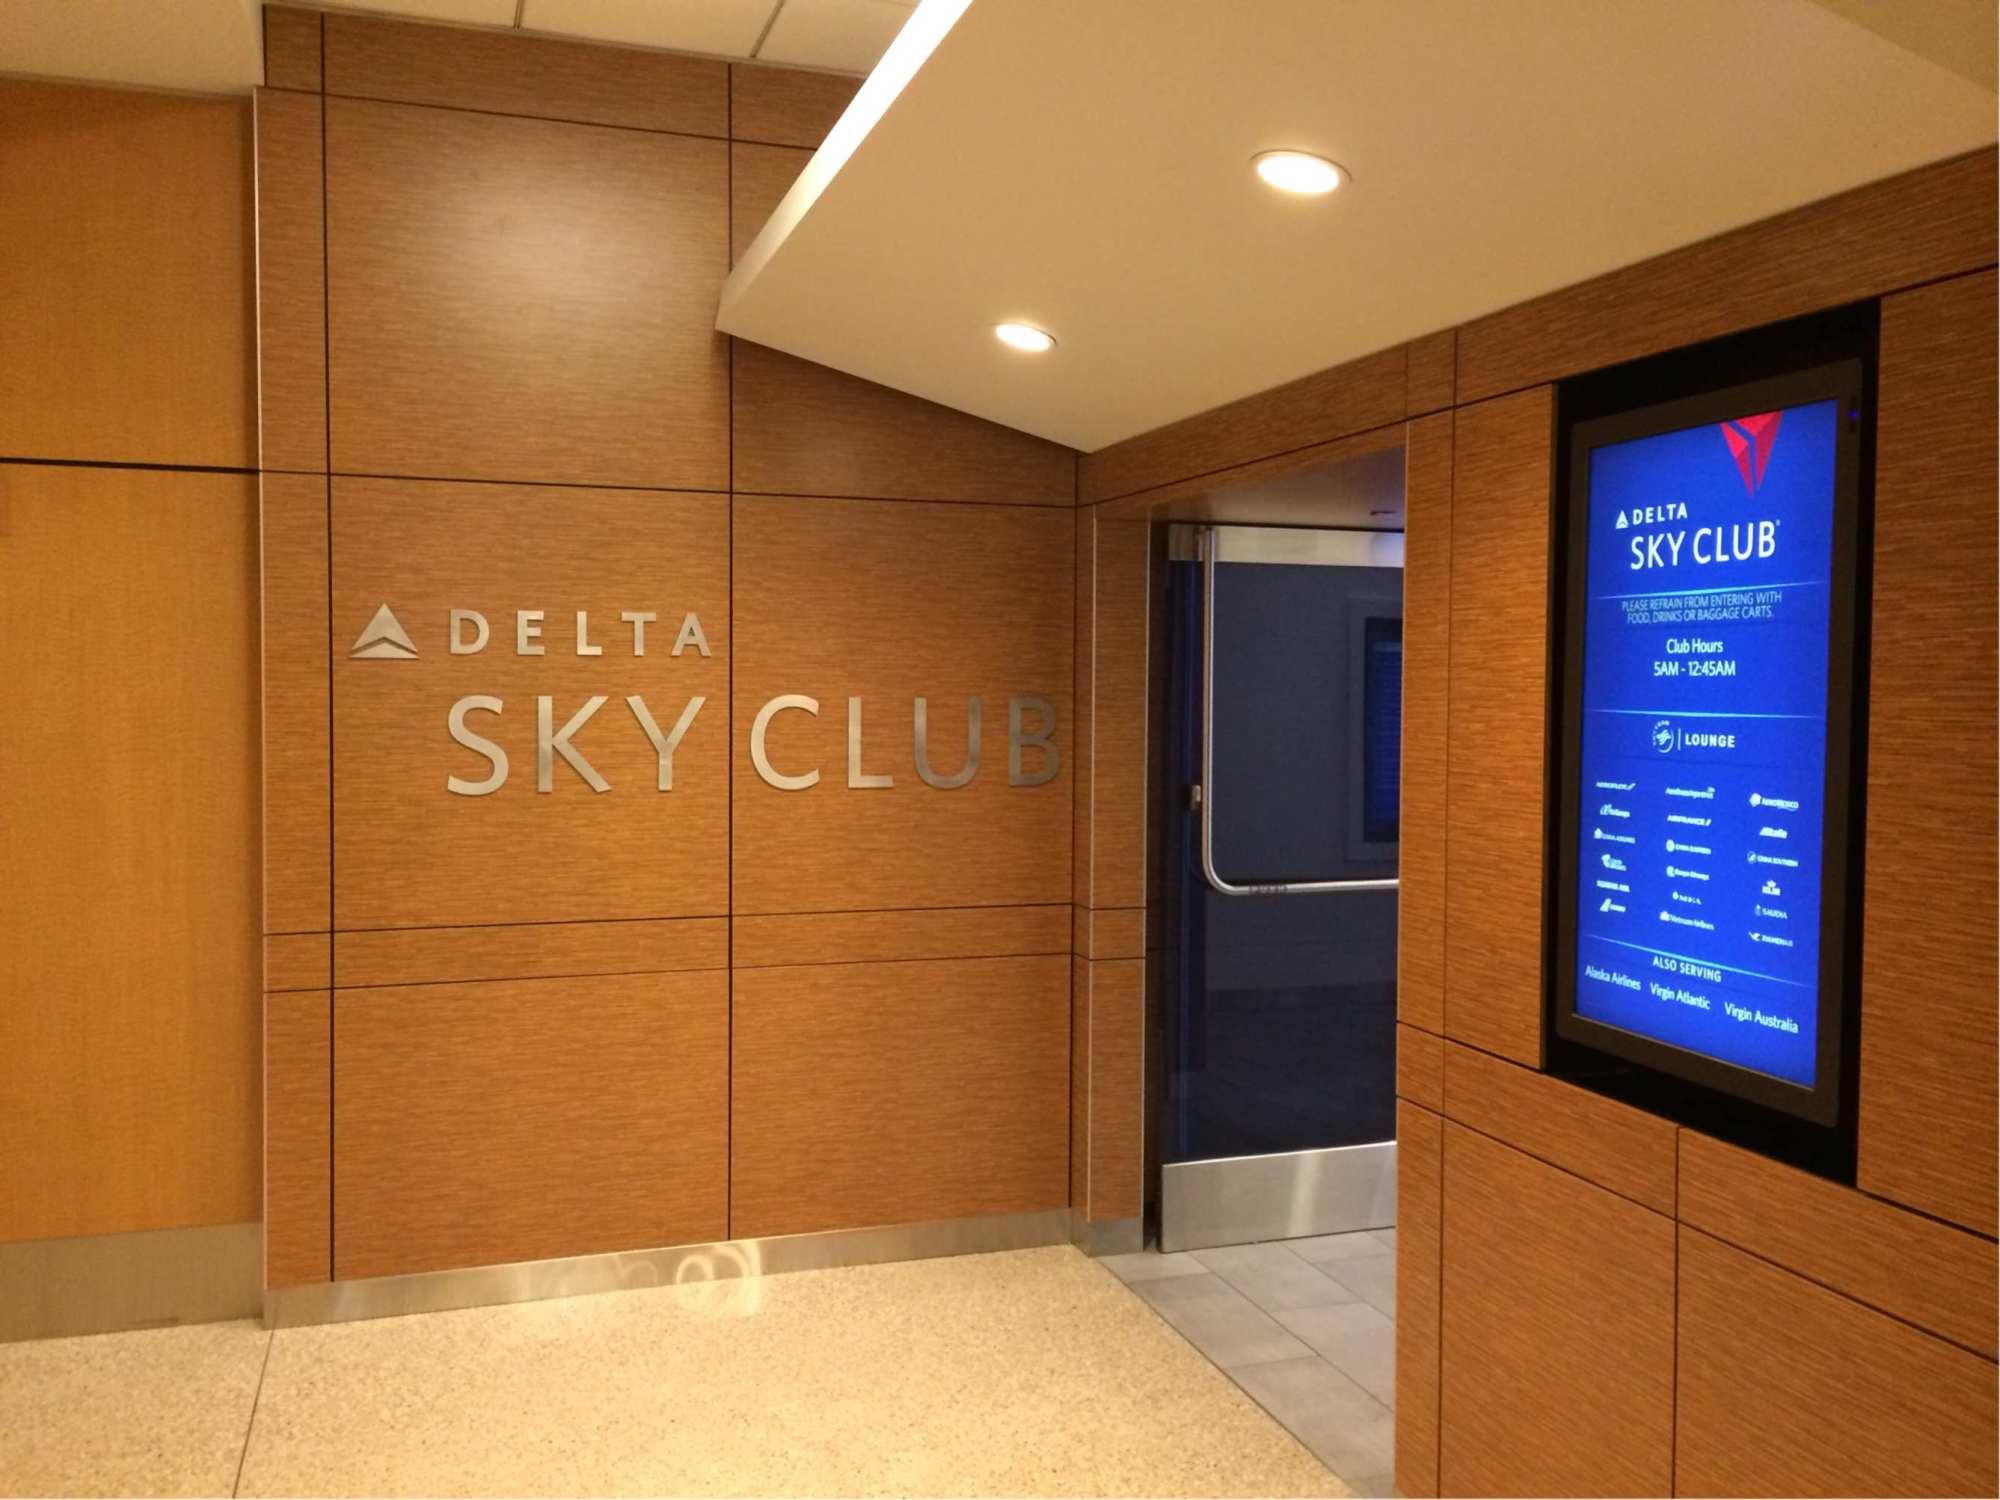 Sea Delta Air Lines Delta Sky Club Reviews Amp Photos